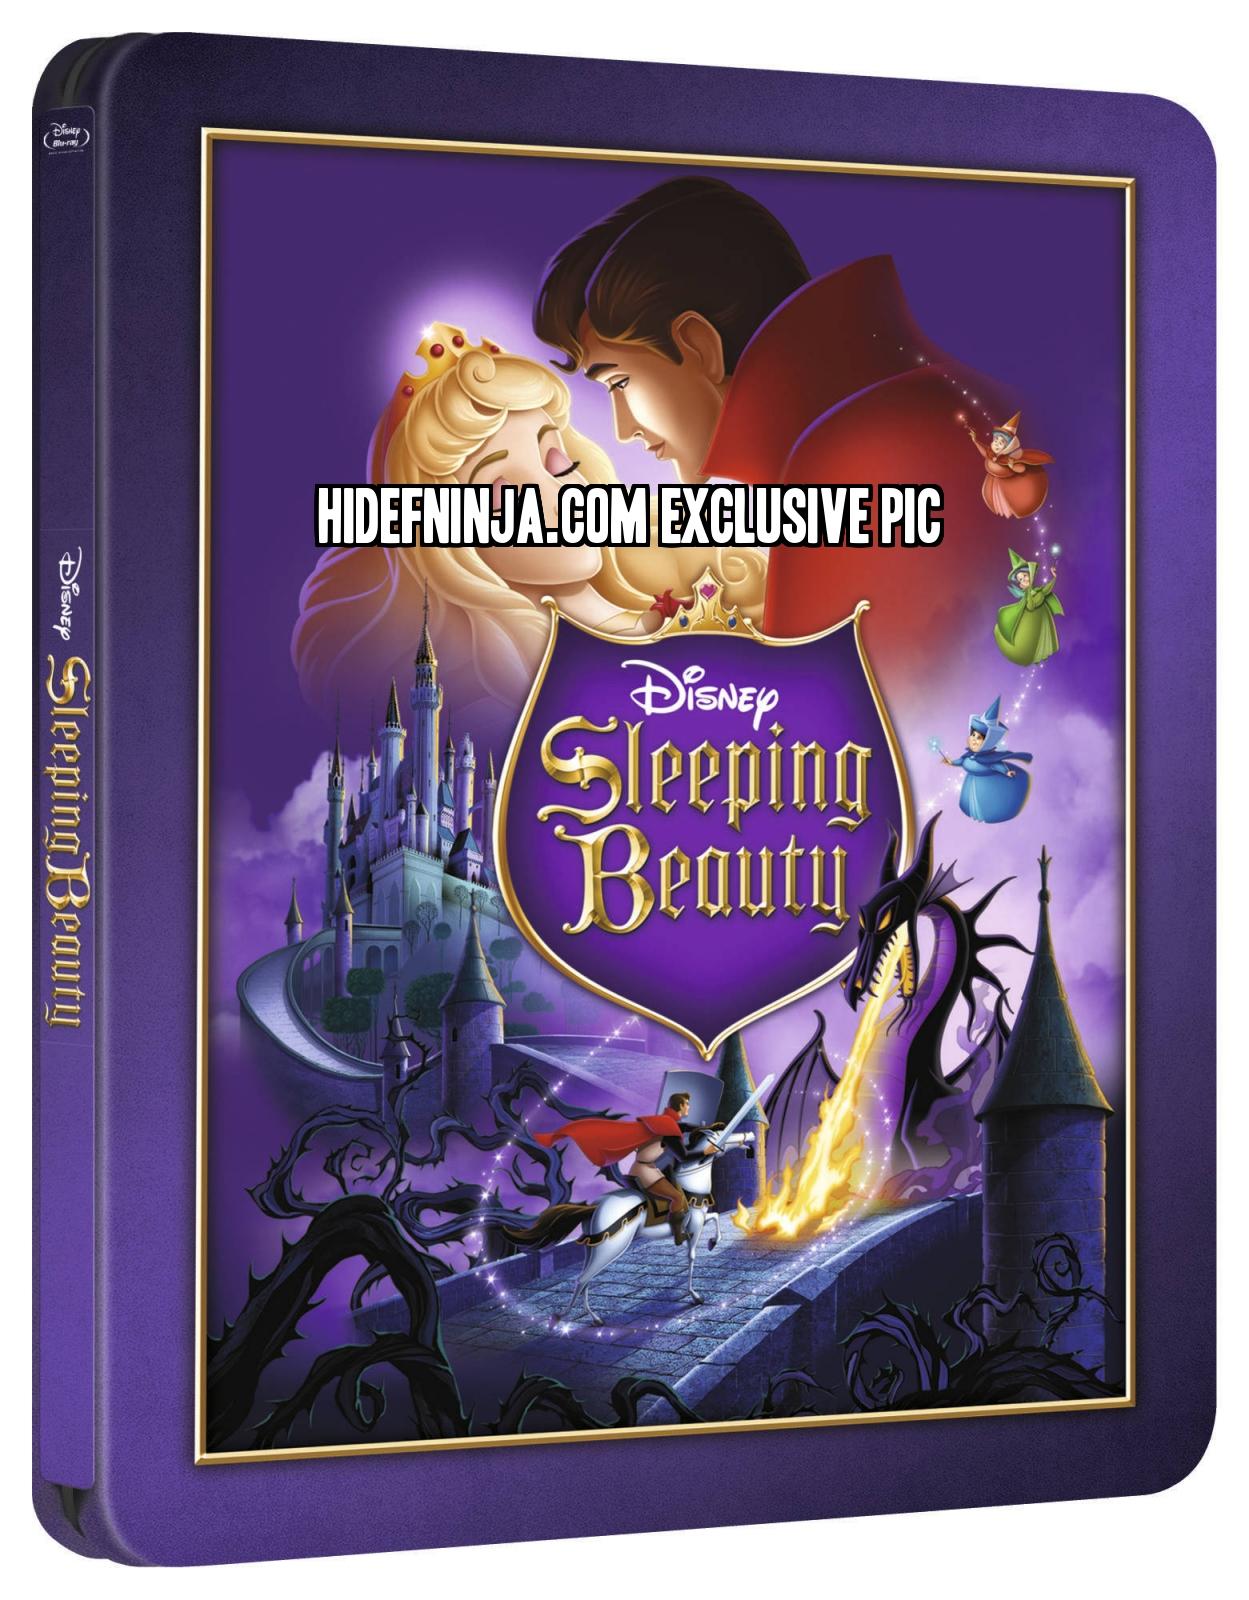 La Belle Au Bois Dormant En Anglais : belle, dormant, anglais, Sleeping, Beauty, (Blu-ray, SteelBook), (Zavvi, Exclusive:, Disney, Collection, Hi-Def, Ninja, Culture, Movie, Collectible, Community